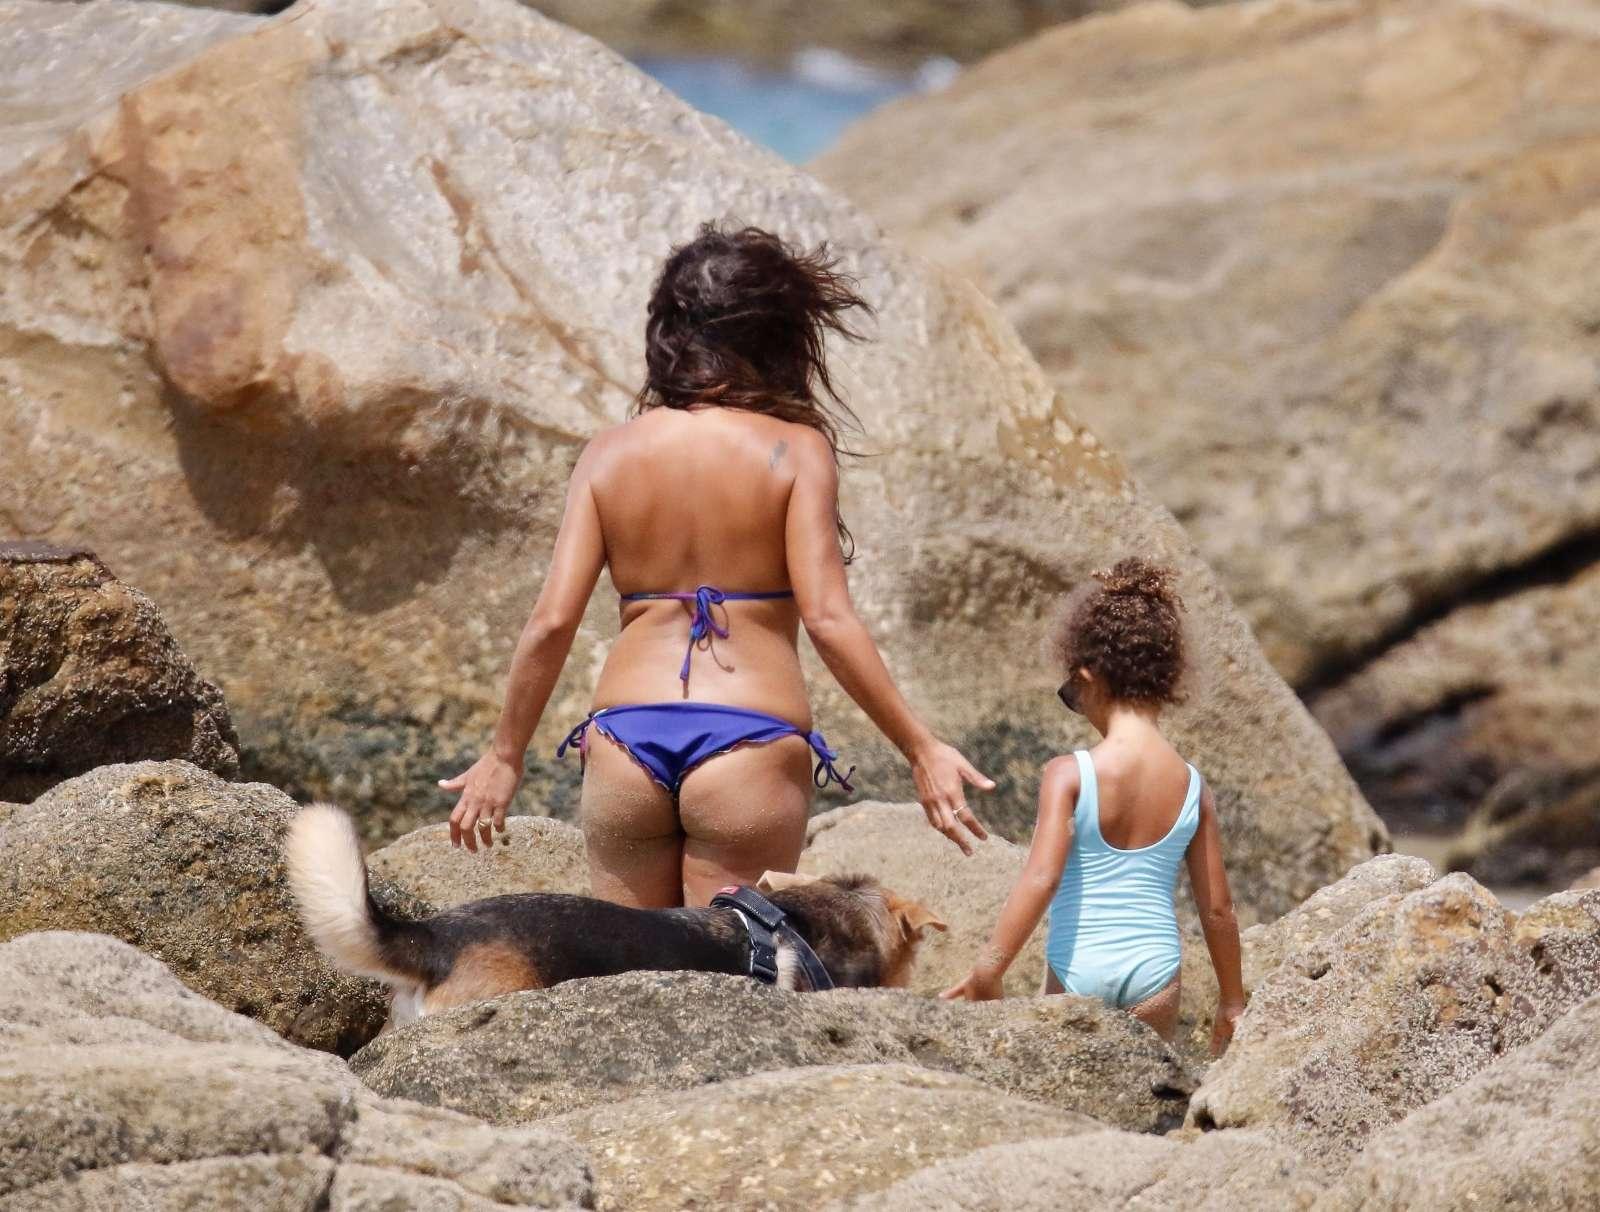 Monica Cruz 2017 : Monica Cruz in Bikini 2017 -93